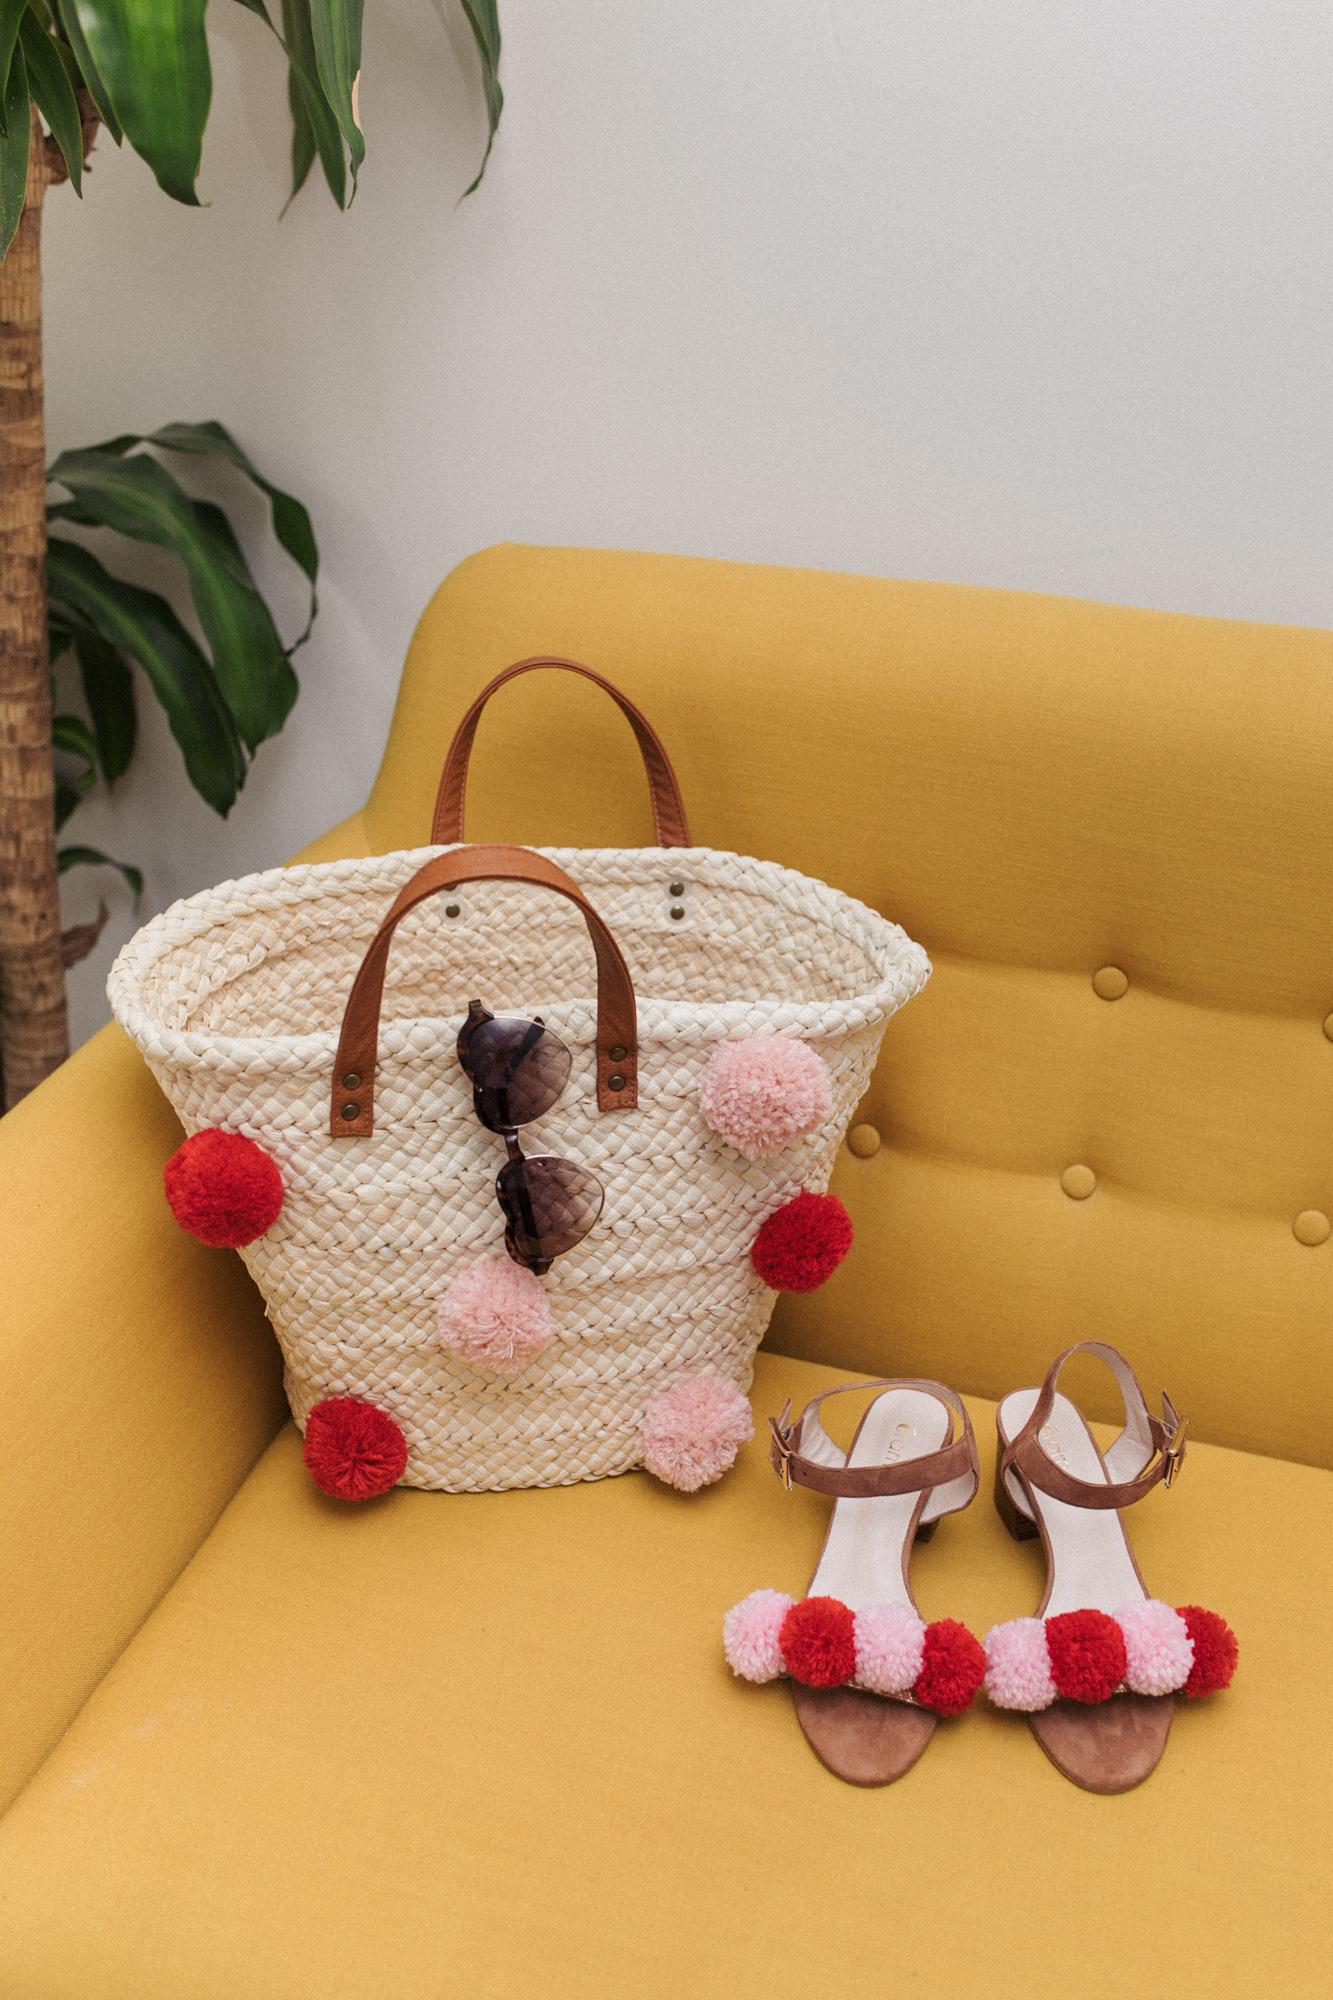 diy 85 le panier et les sandales pompons sp4nk blog. Black Bedroom Furniture Sets. Home Design Ideas